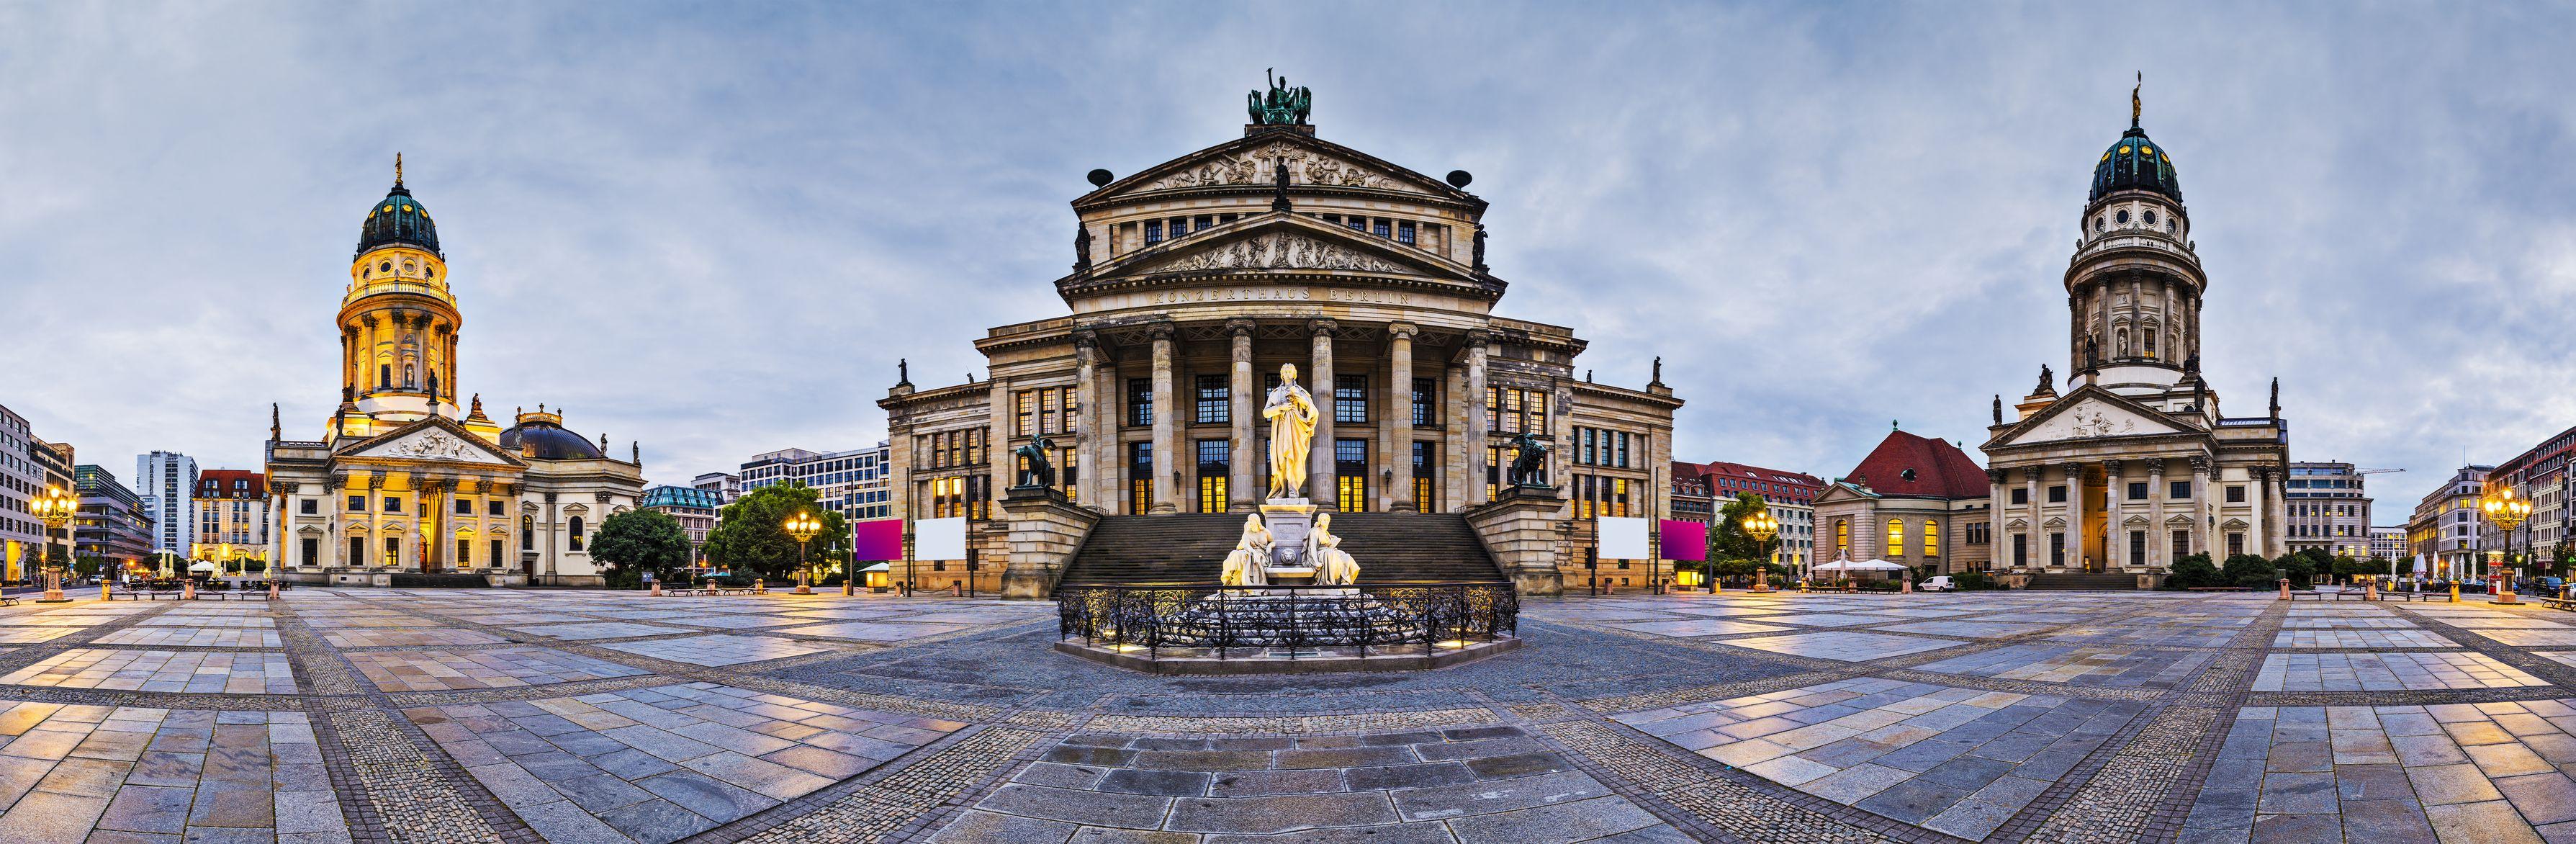 جيندارمينماركت برلين